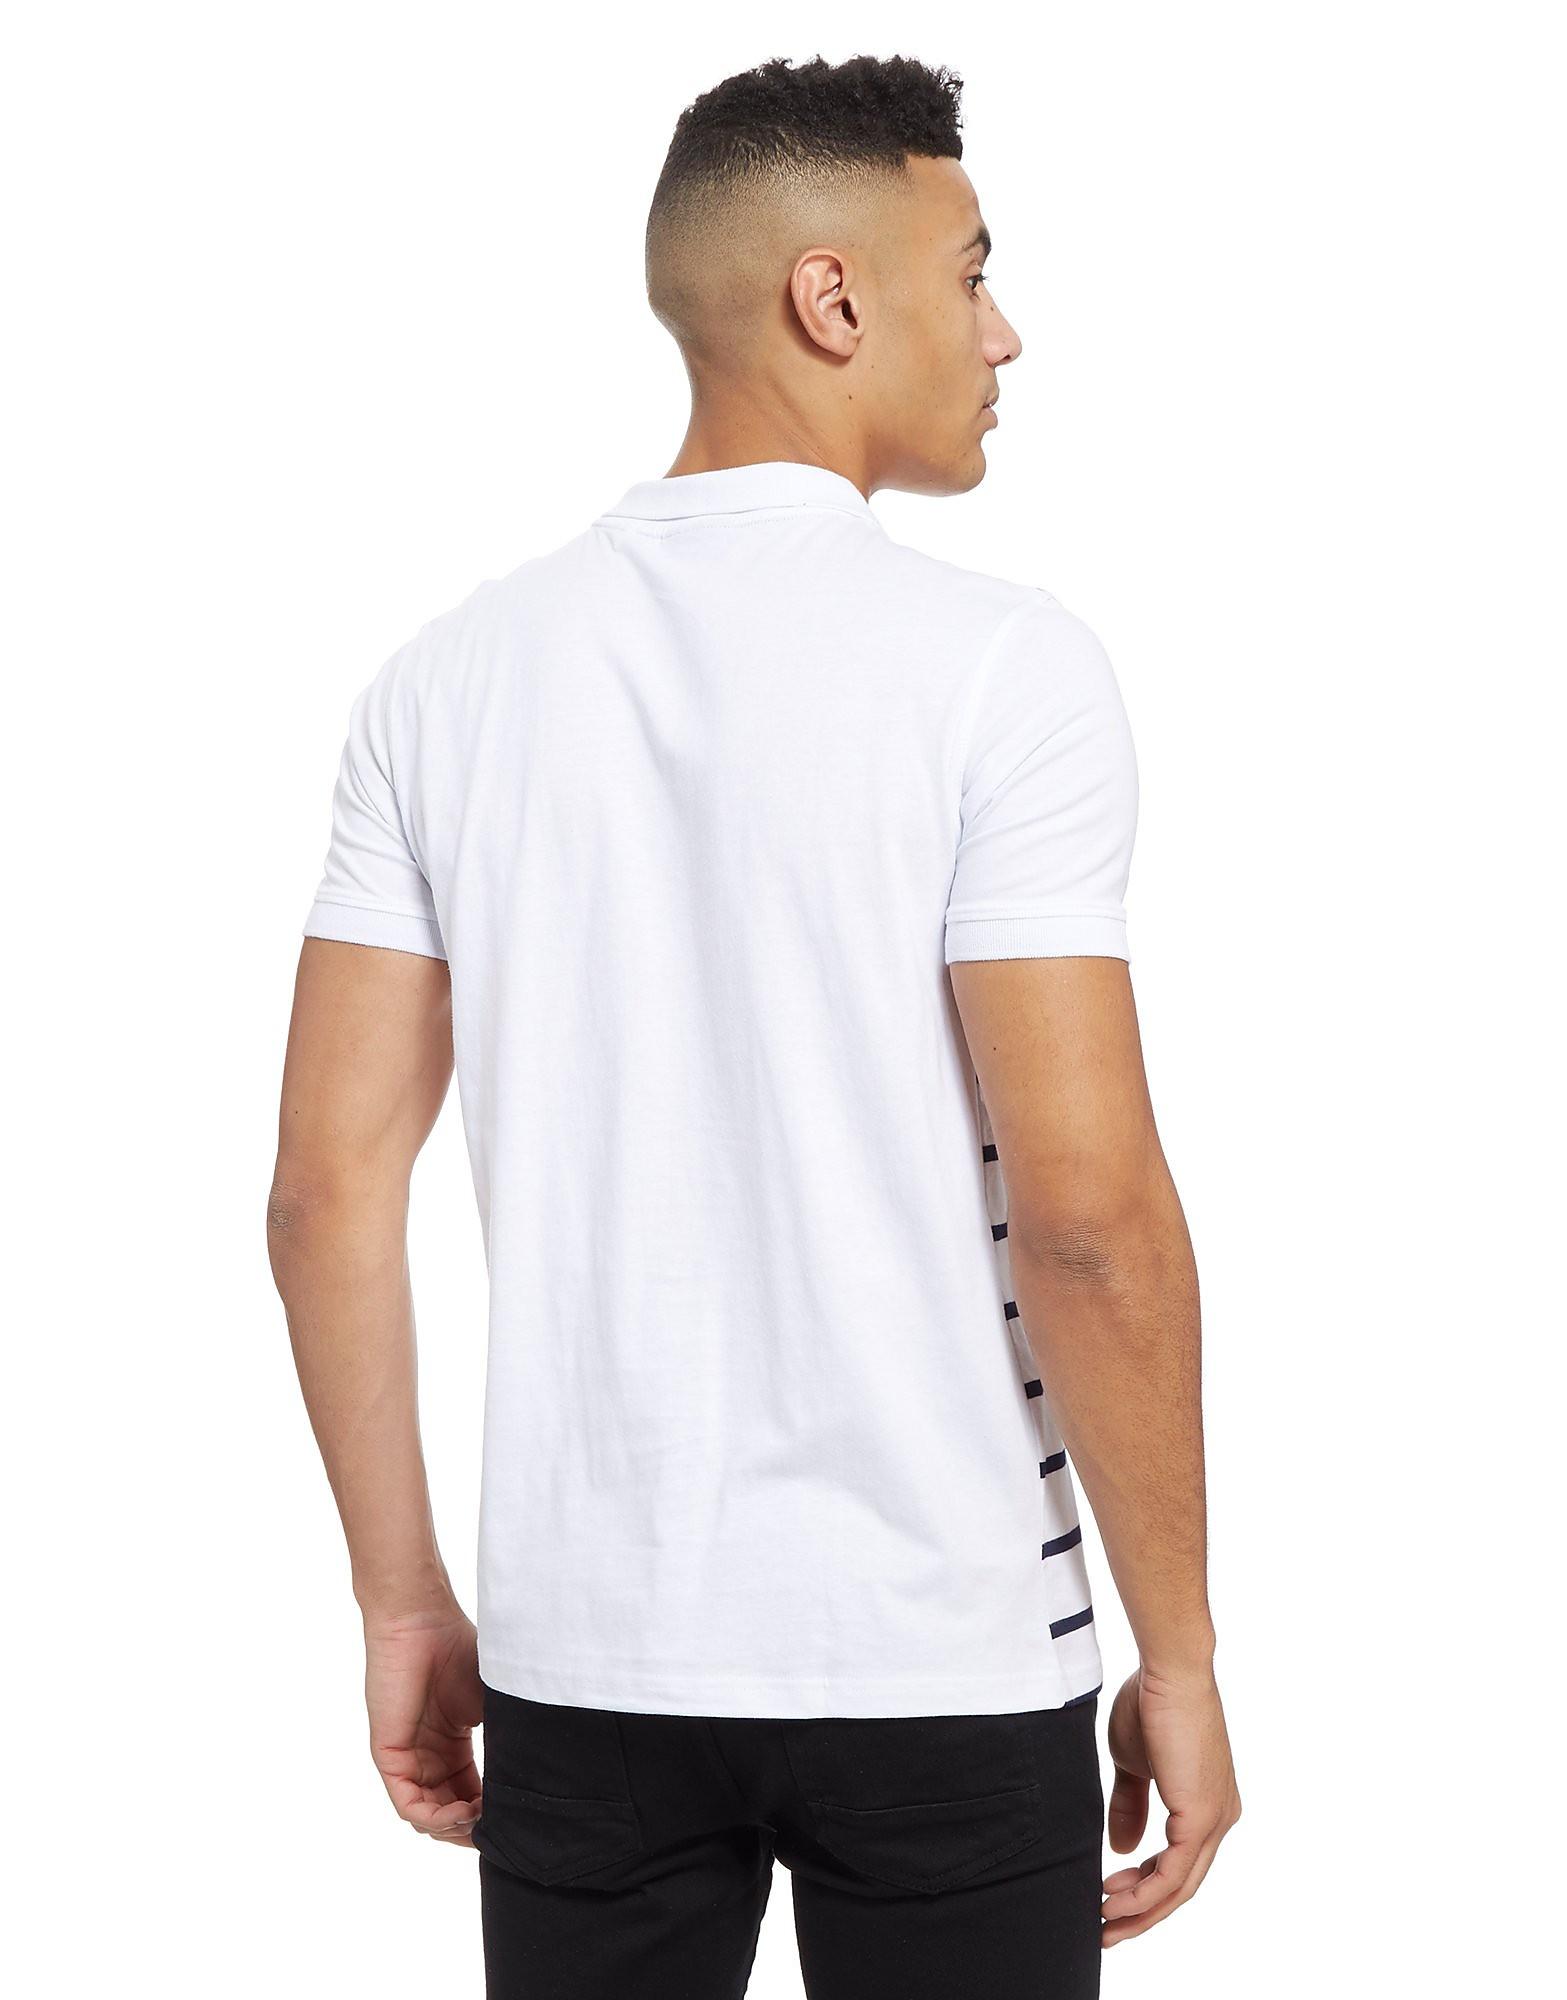 McKenzie Absent Polo Shirt